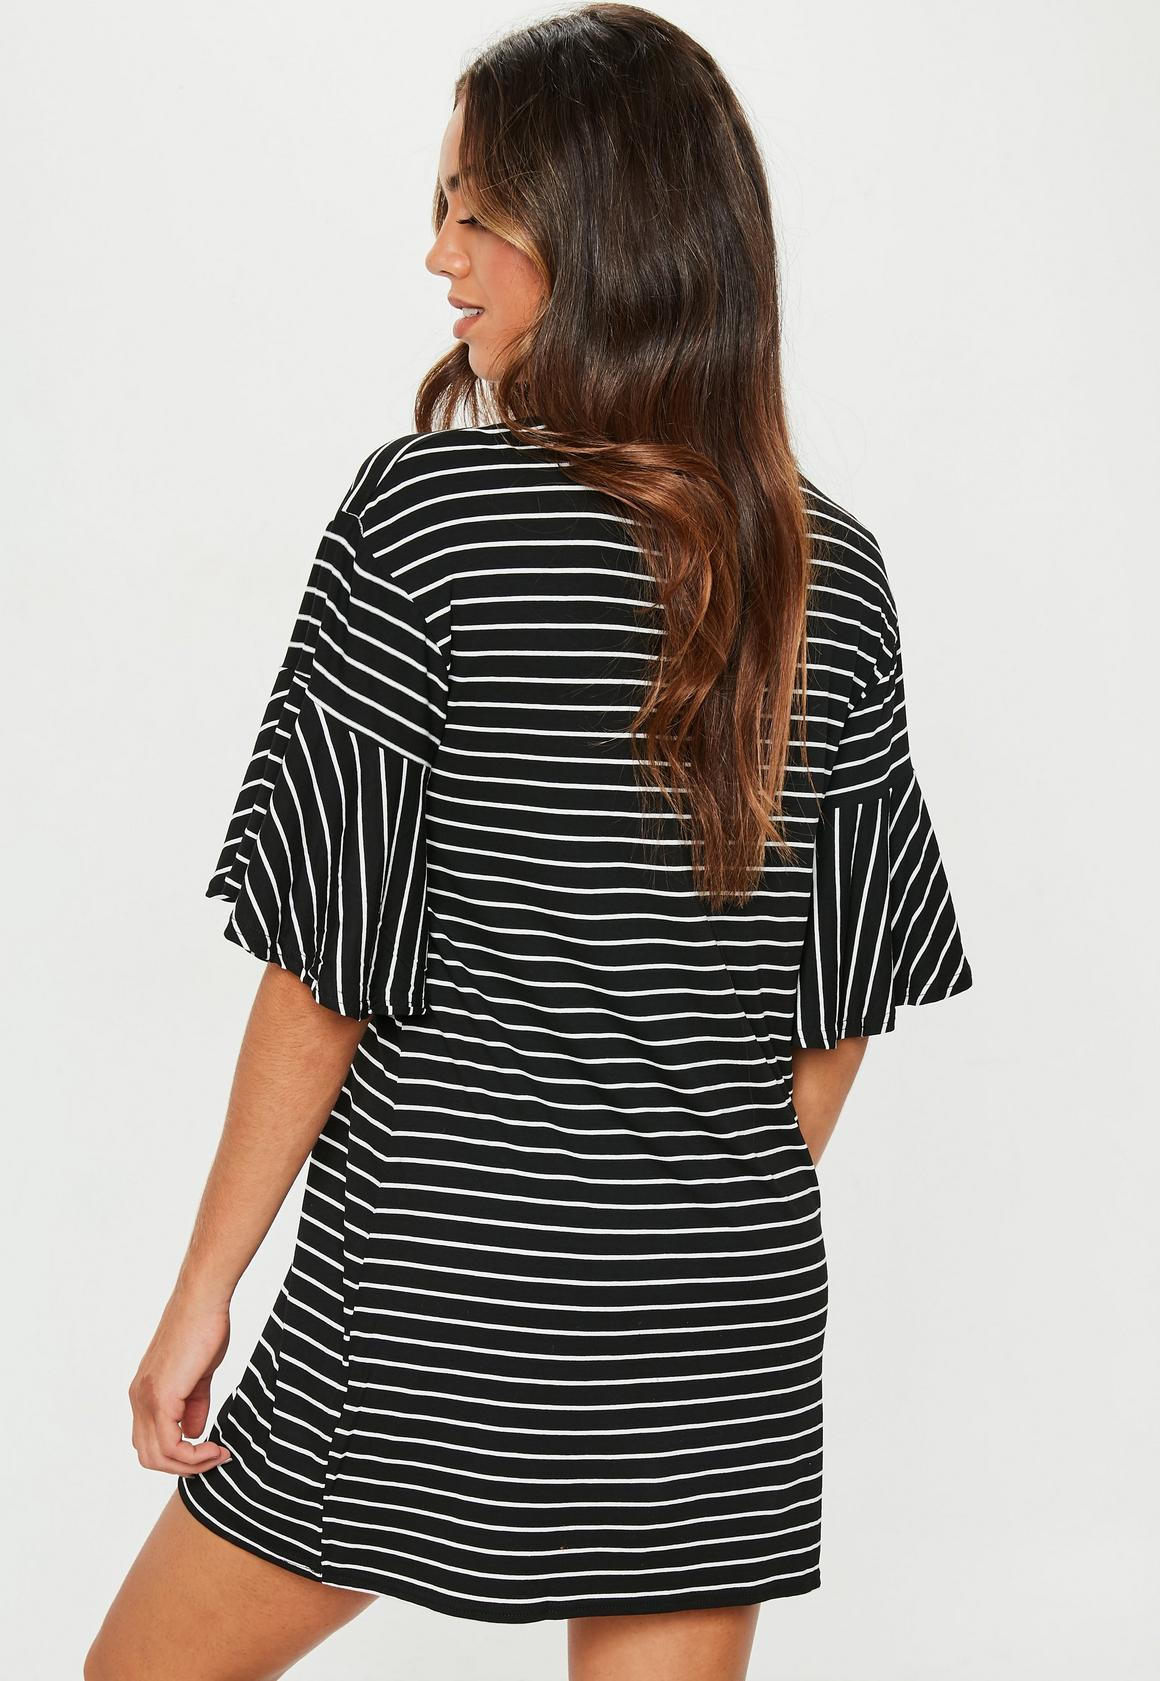 a882061e47 Missguided - Black Striped Jersey Frill Sleeve Detail T Shirt Dress, Black  - 4